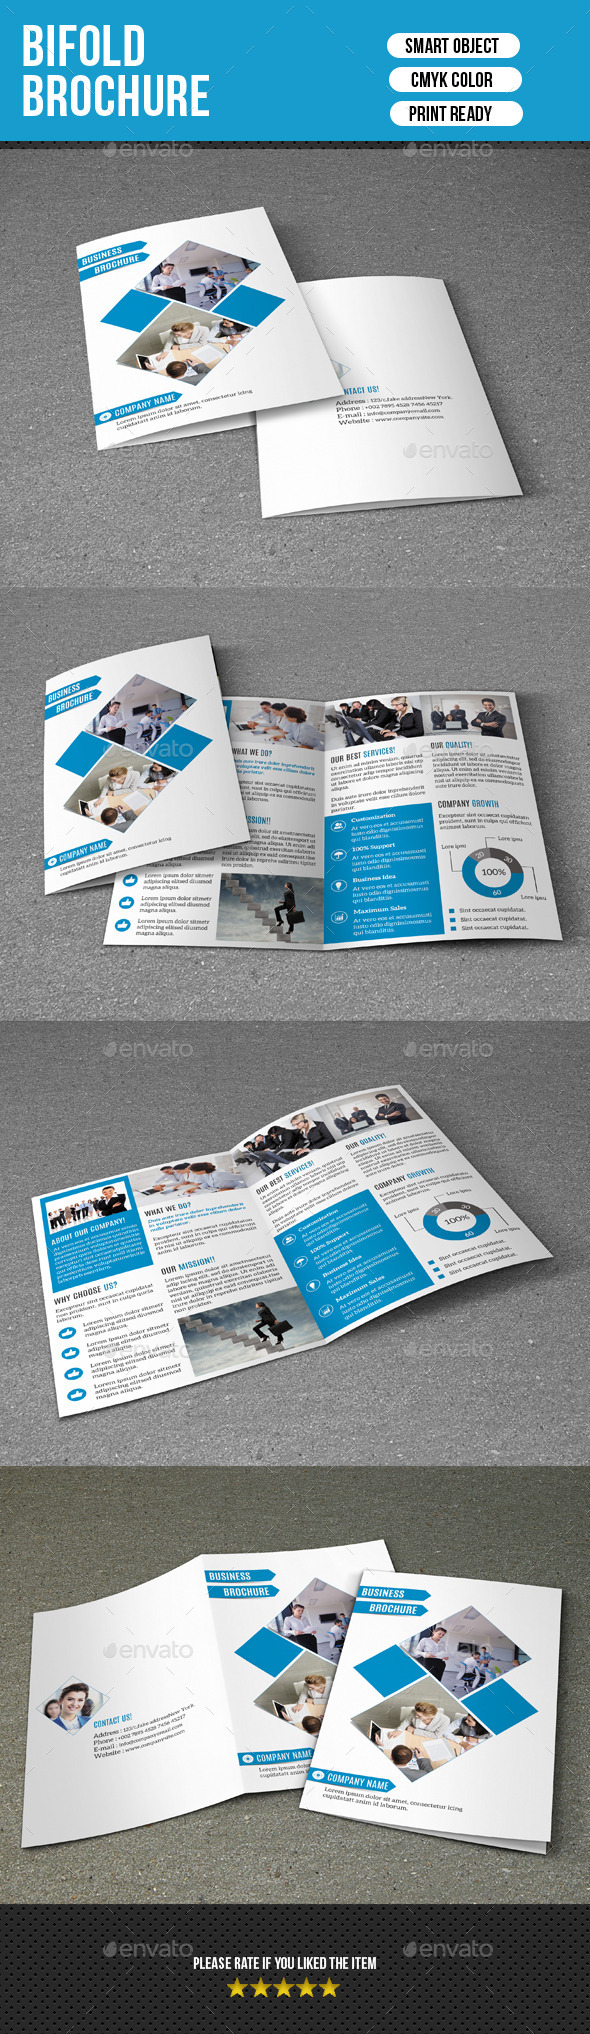 Bifold Business Brochure-V164 - Corporate Brochures